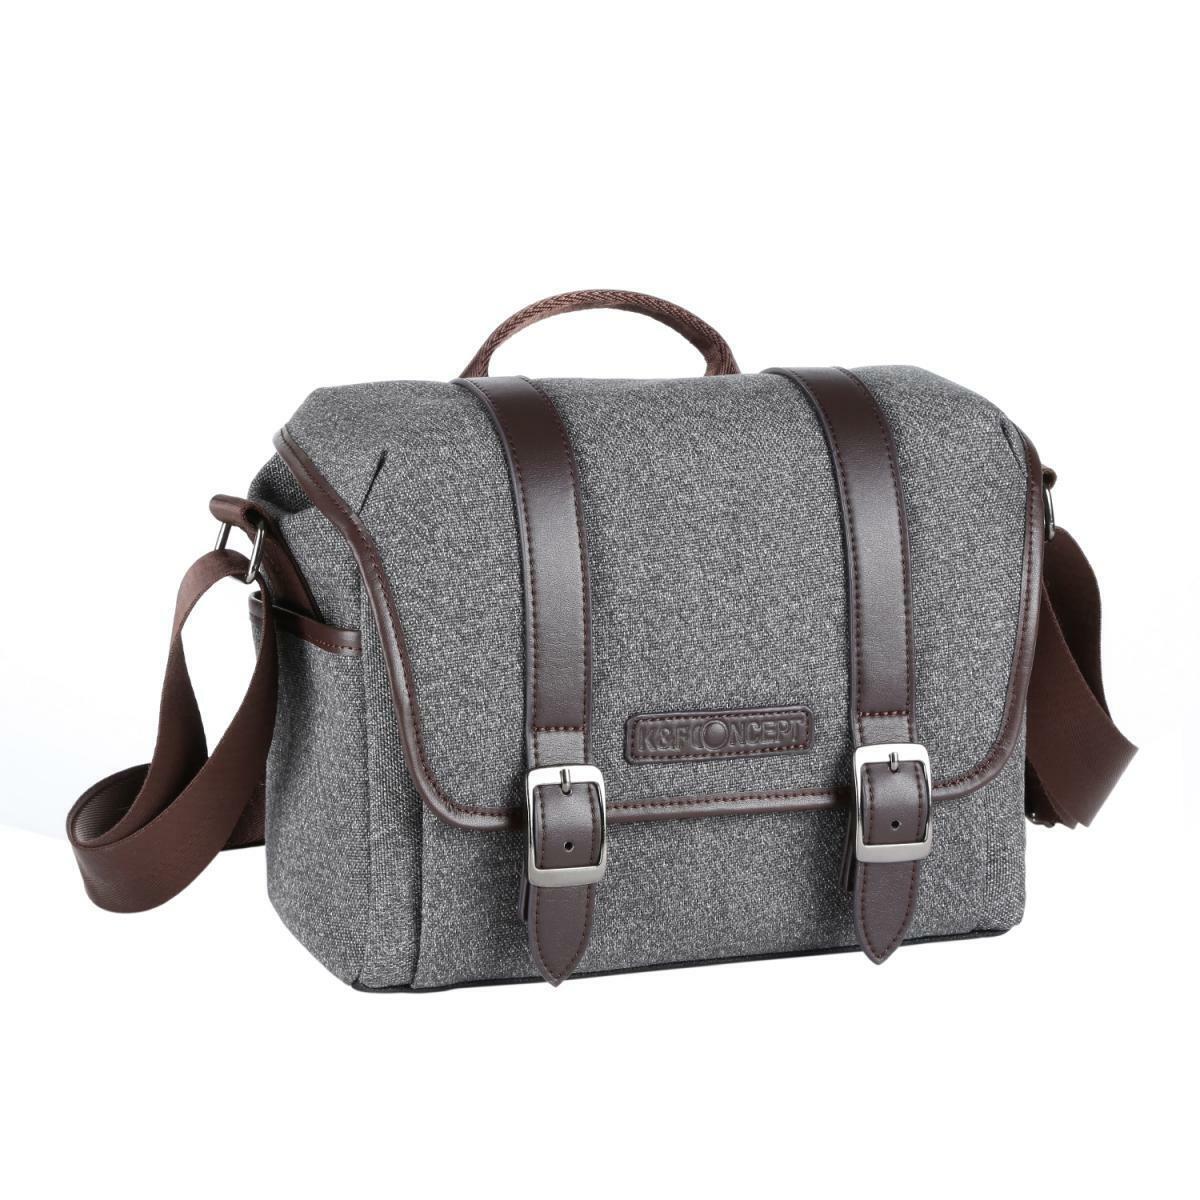 K&F Concept Portable Waterproof Small Camera Gadget DSLR Shoulder/Messenger Bag